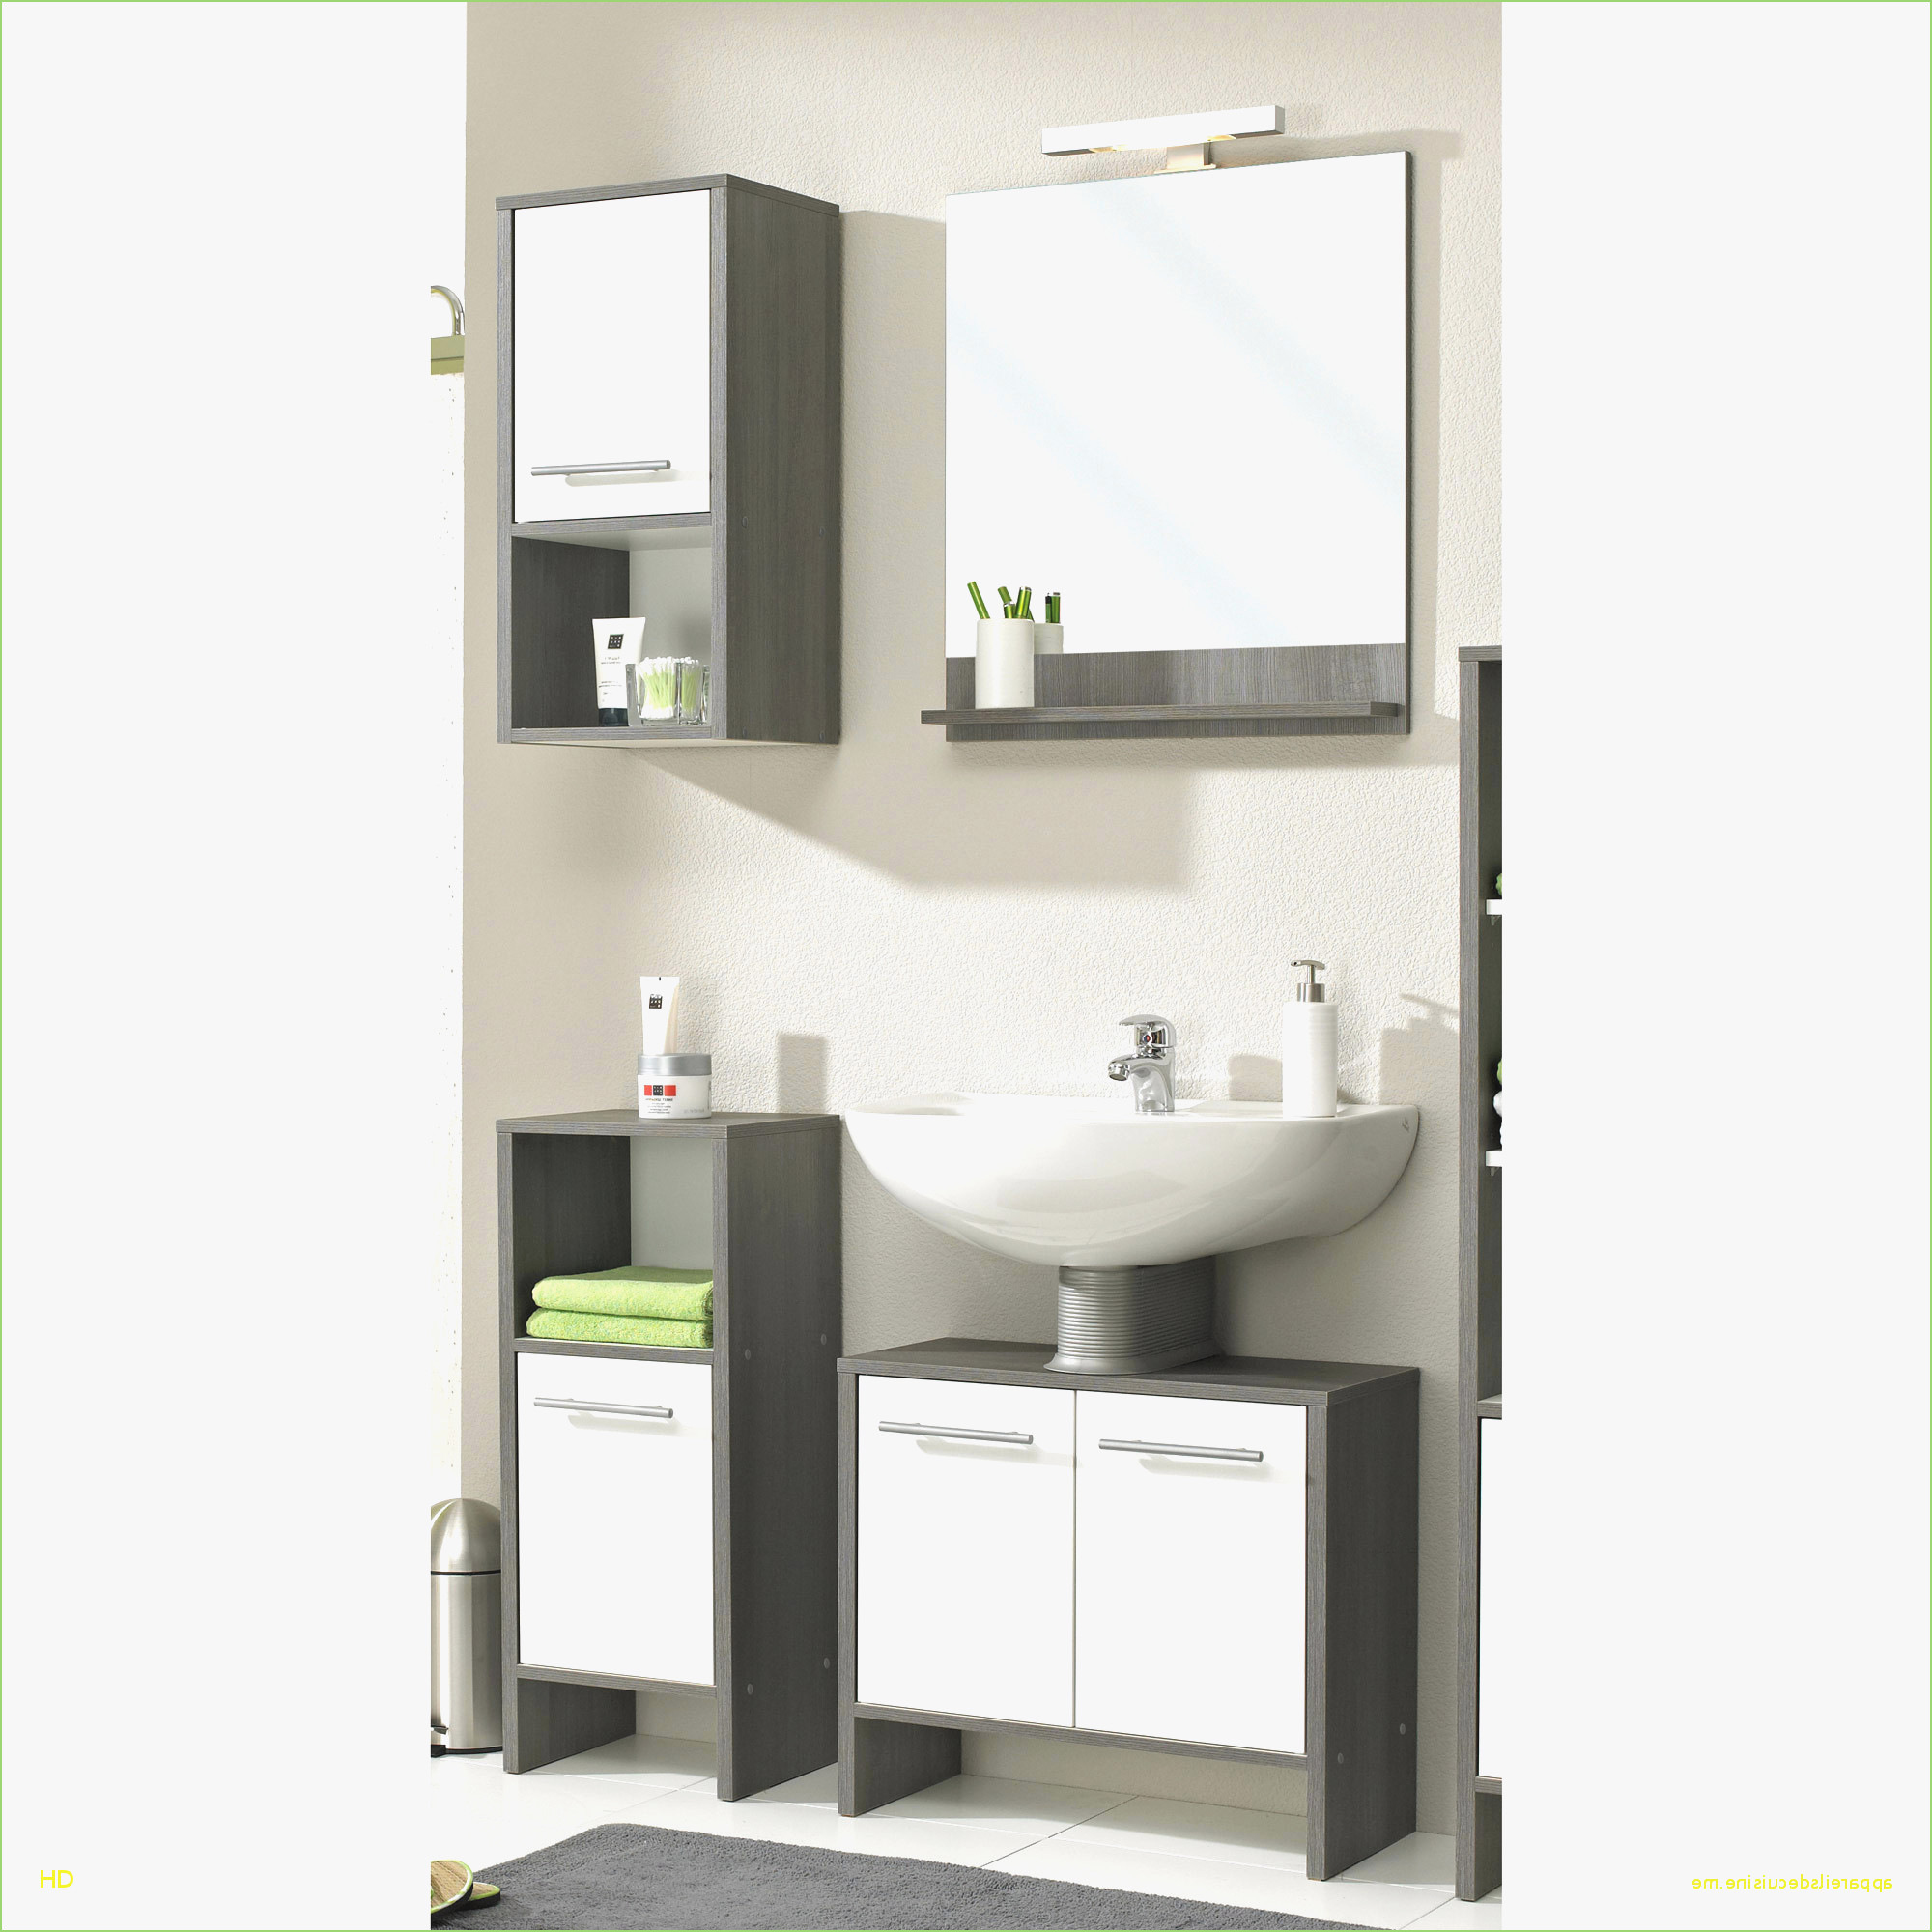 Armoire De toilette Miroir Castorama Beau Collection Nouveau Meuble Miroir Salle De Bain